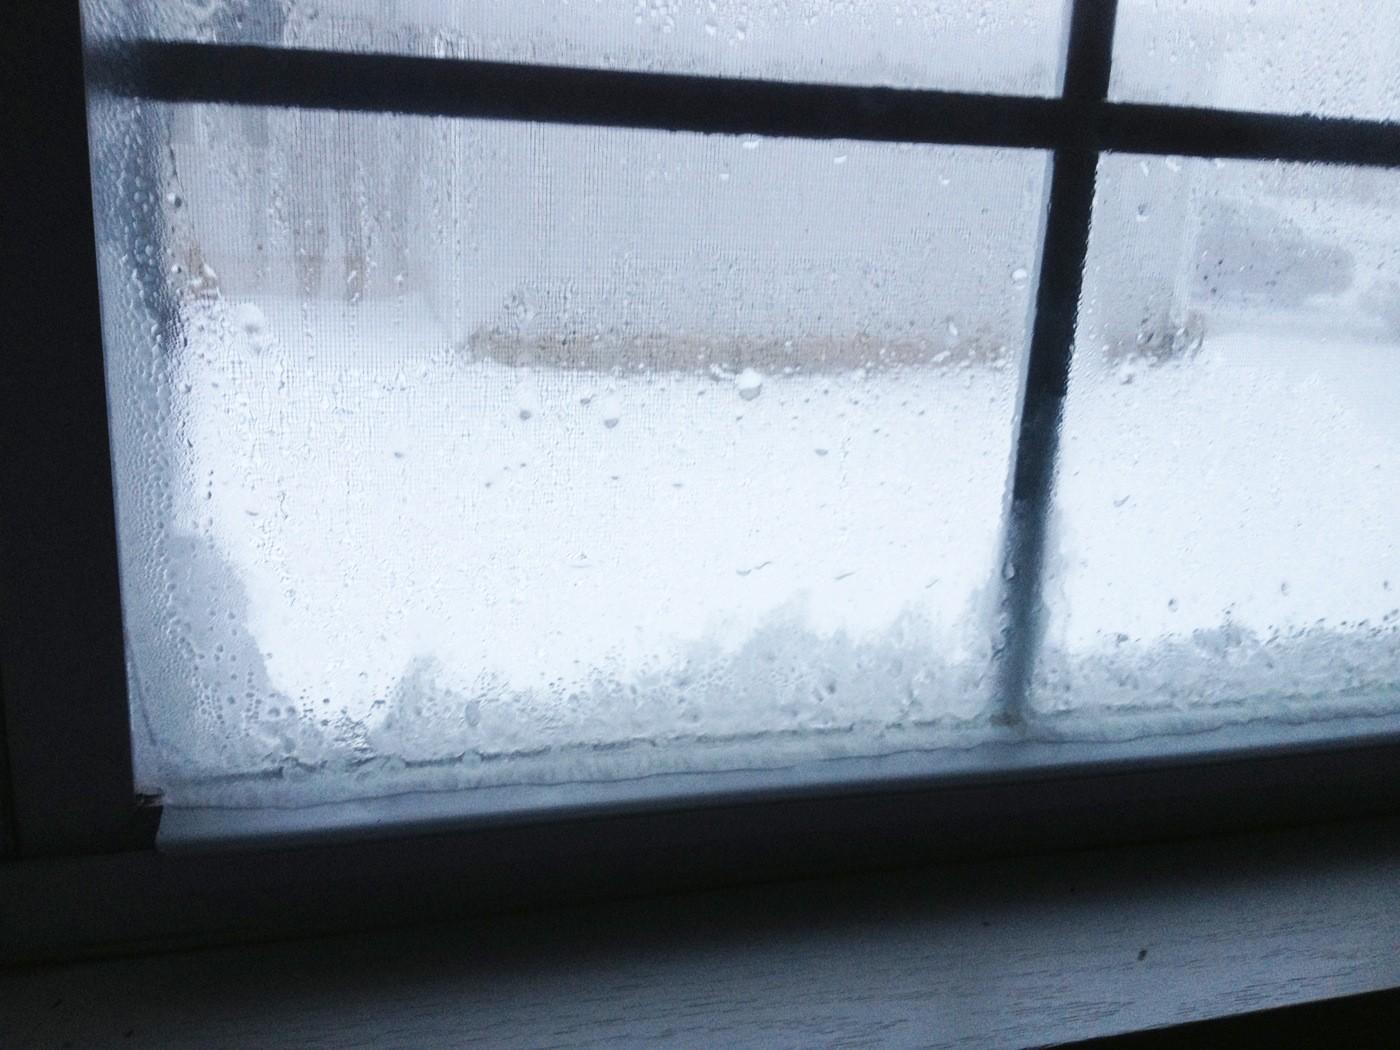 Seal windows in winter